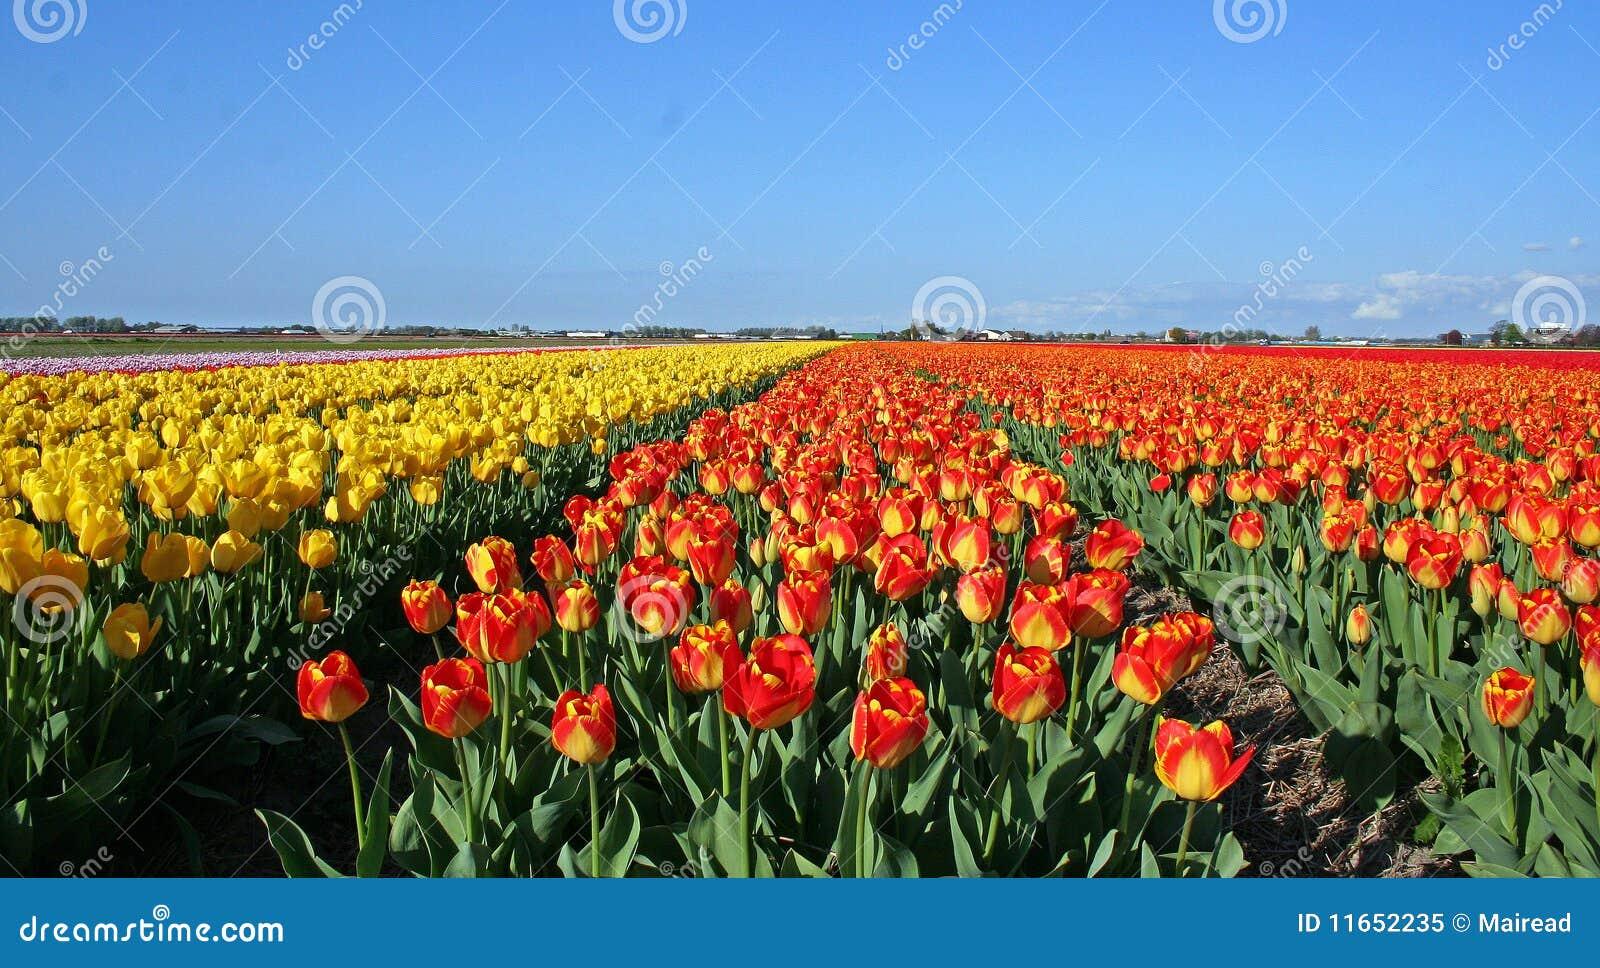 Price On Nylon Dreams Tulip 35